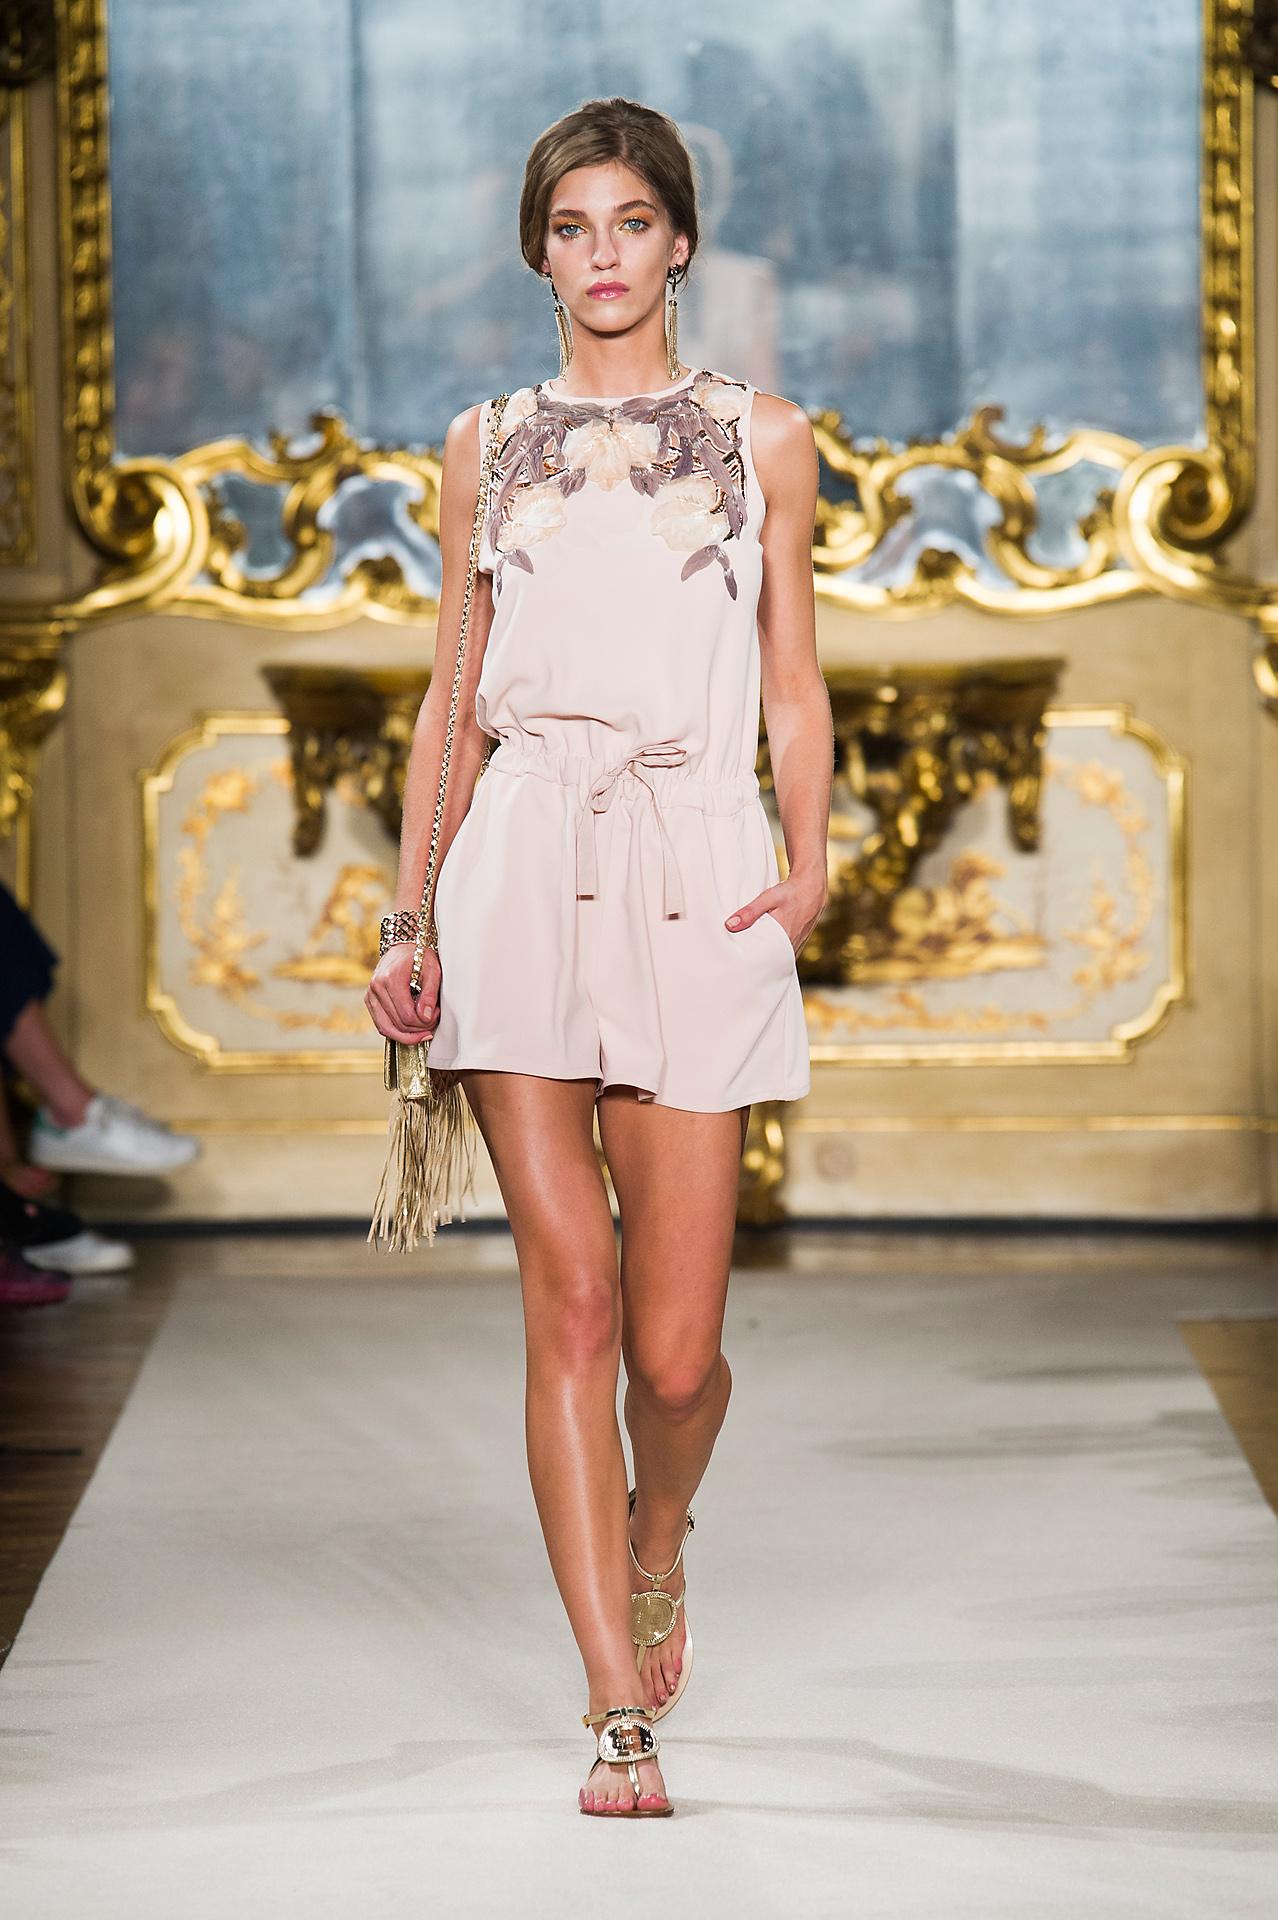 Elisabetta Franchi Spring Summer 2015 Fashion Show The Looks Elisabetta Franchi